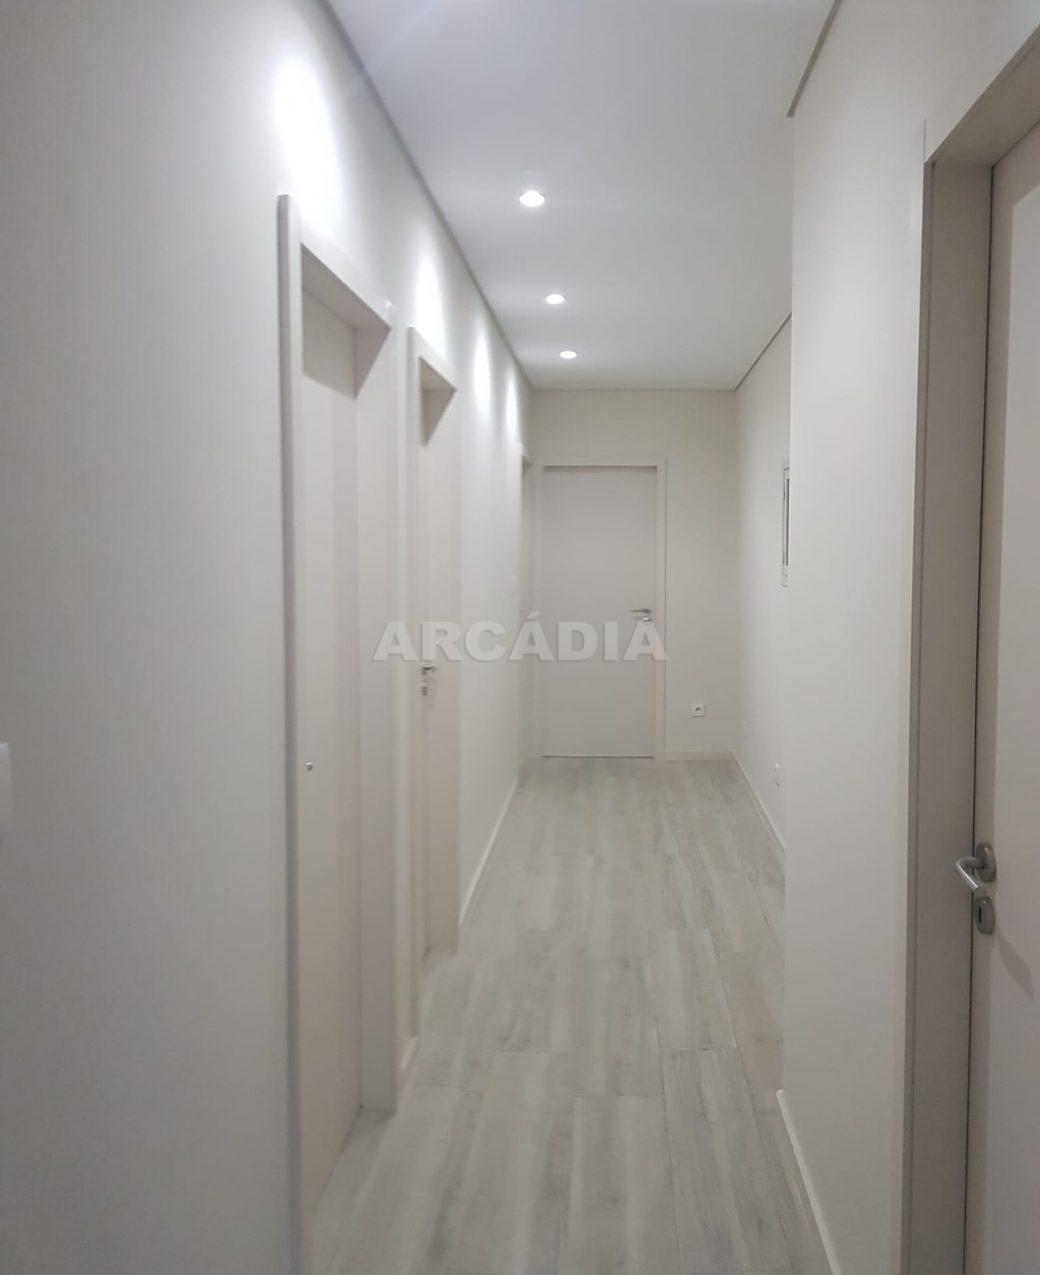 arcadia-imobiliaria-braga-apartamento-tipo-3-arrendamento-sao-lazaro-remodelado-excelente-preco-unica-oportunidade15